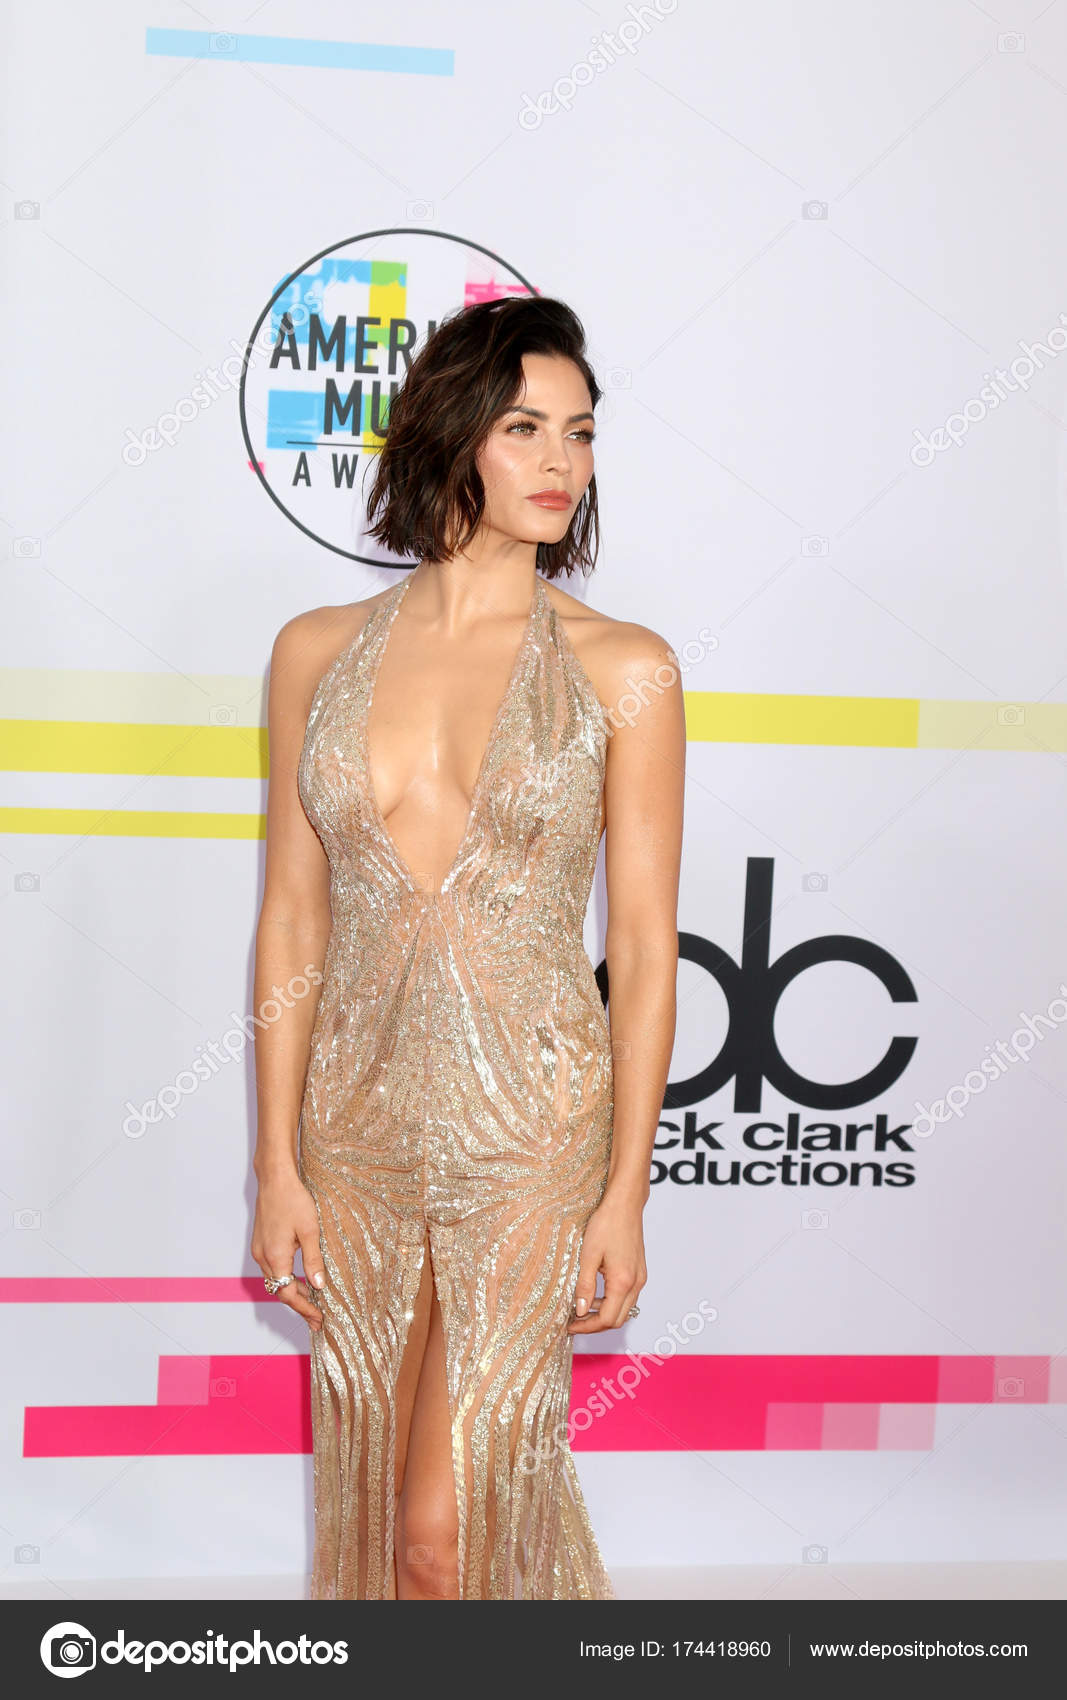 Celebrites Alexandra Klim naked (12 photos), Pussy, Paparazzi, Boobs, butt 2019